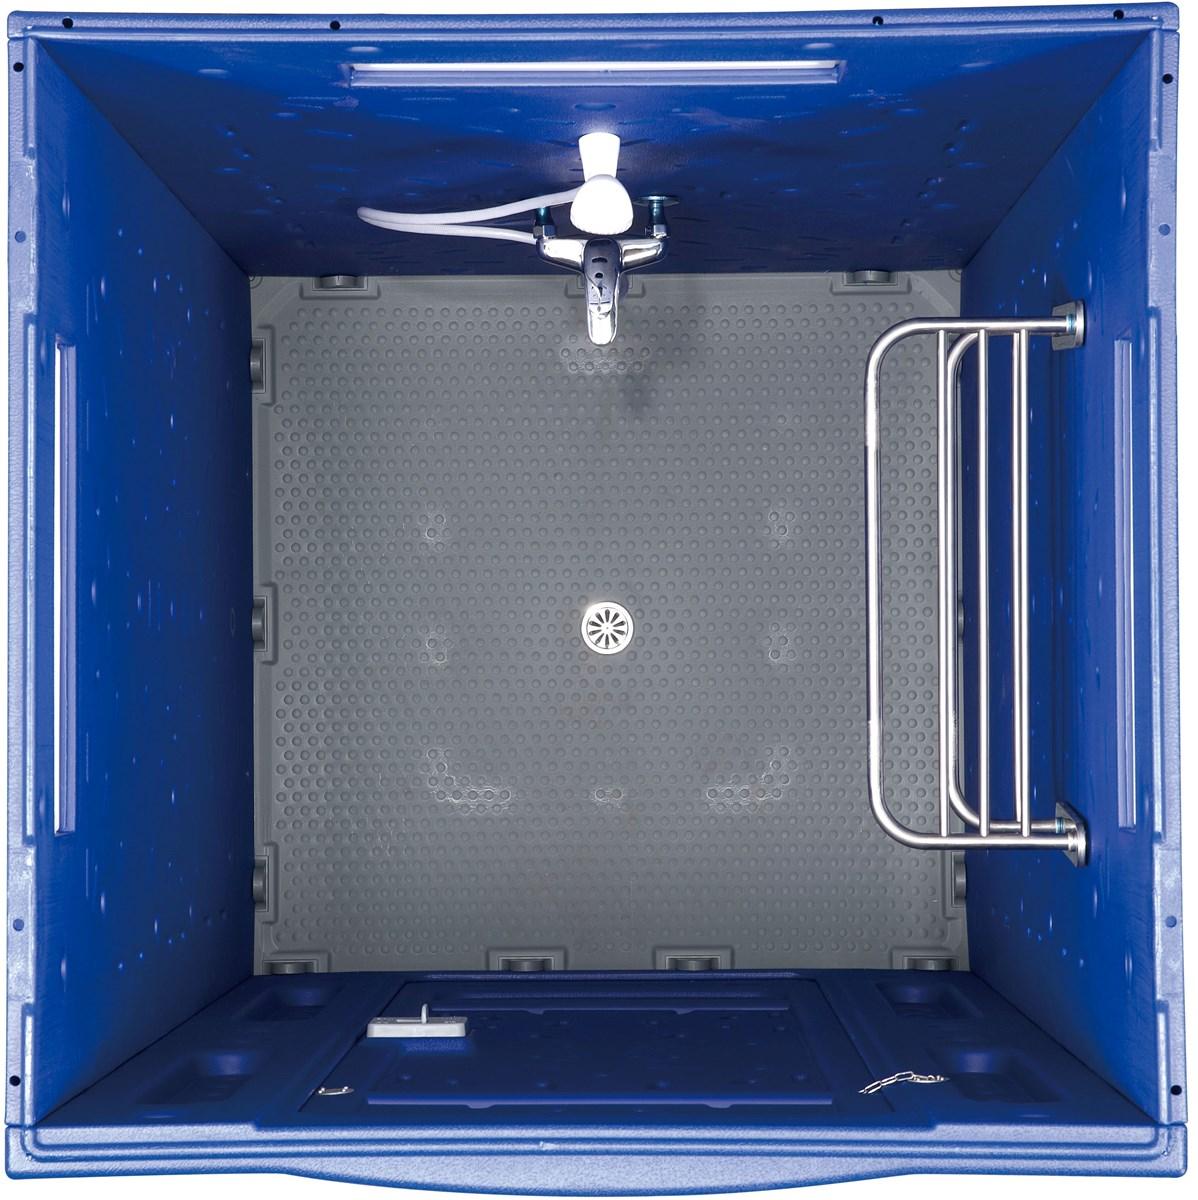 Convenient Double Walls Porta Washroom For Outdoor Portable Shower Room PS580